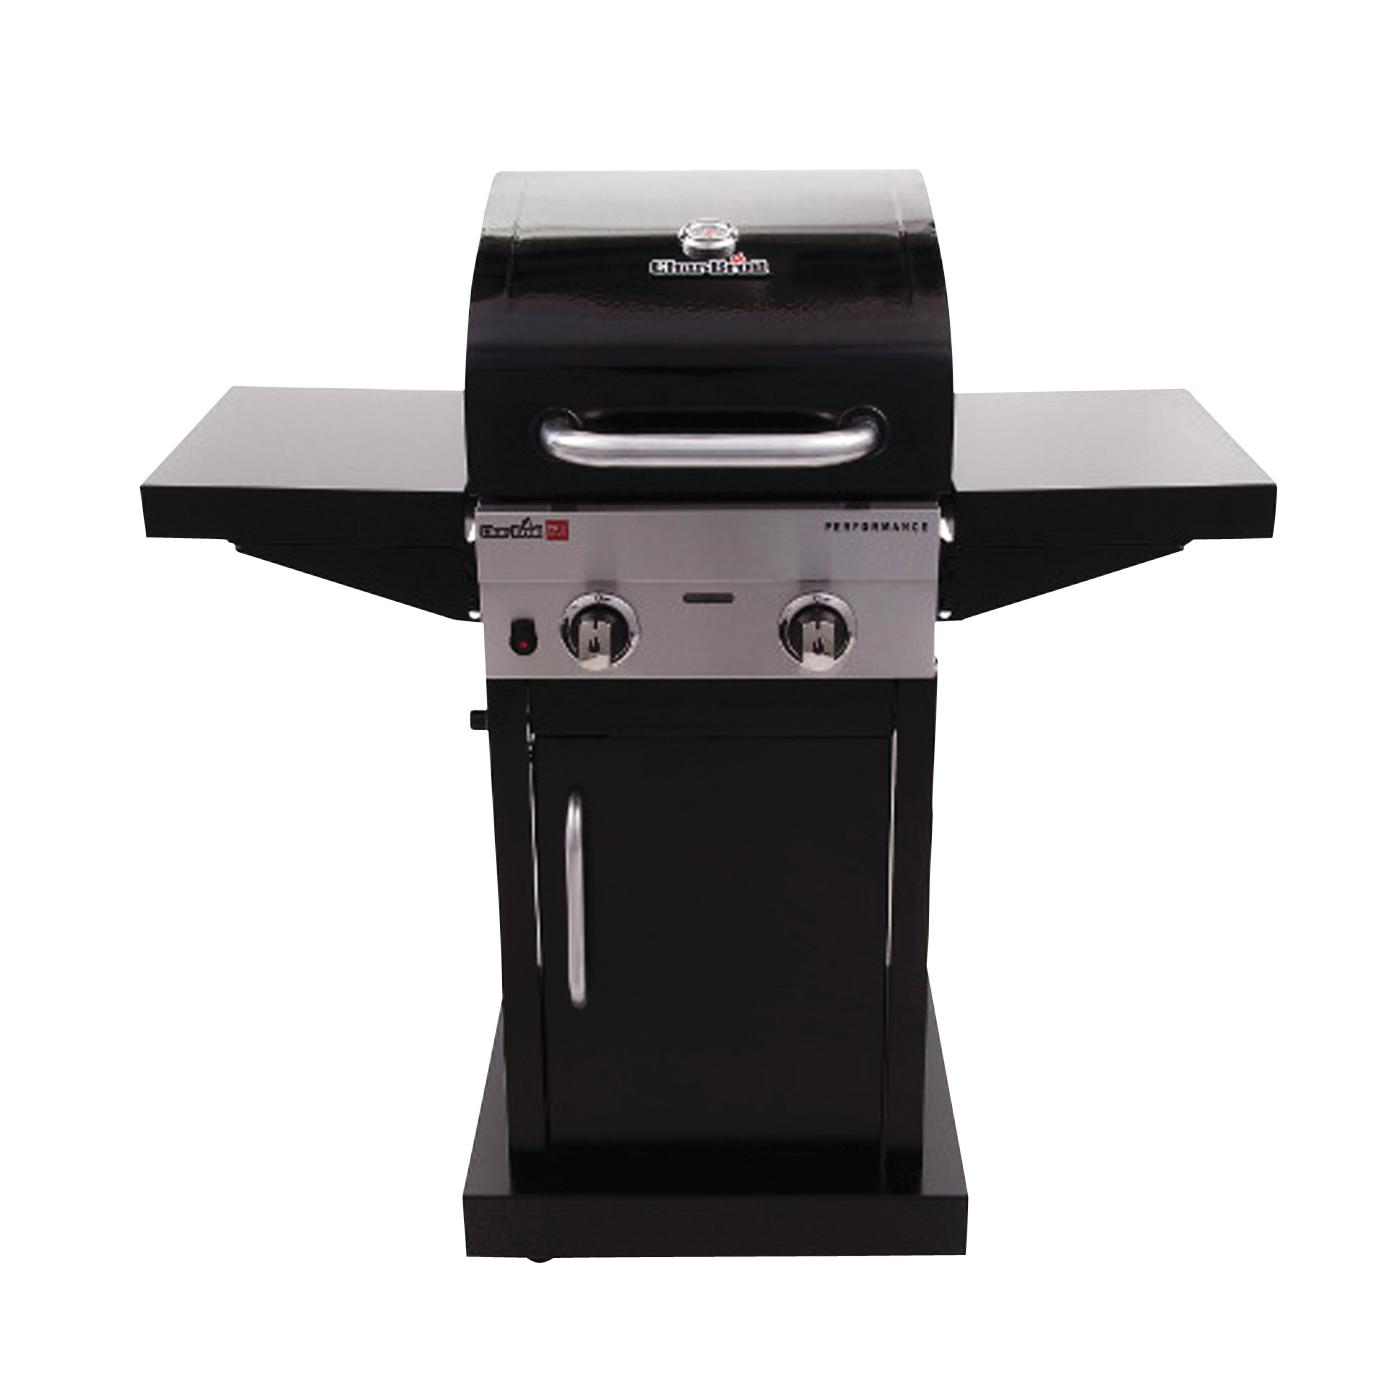 Picture of Char-Broil 463672016 Performance Gas Grill, 18,000 Btu BTU, Liquid Propane, 2 -Burner, Stainless Steel Body, Black